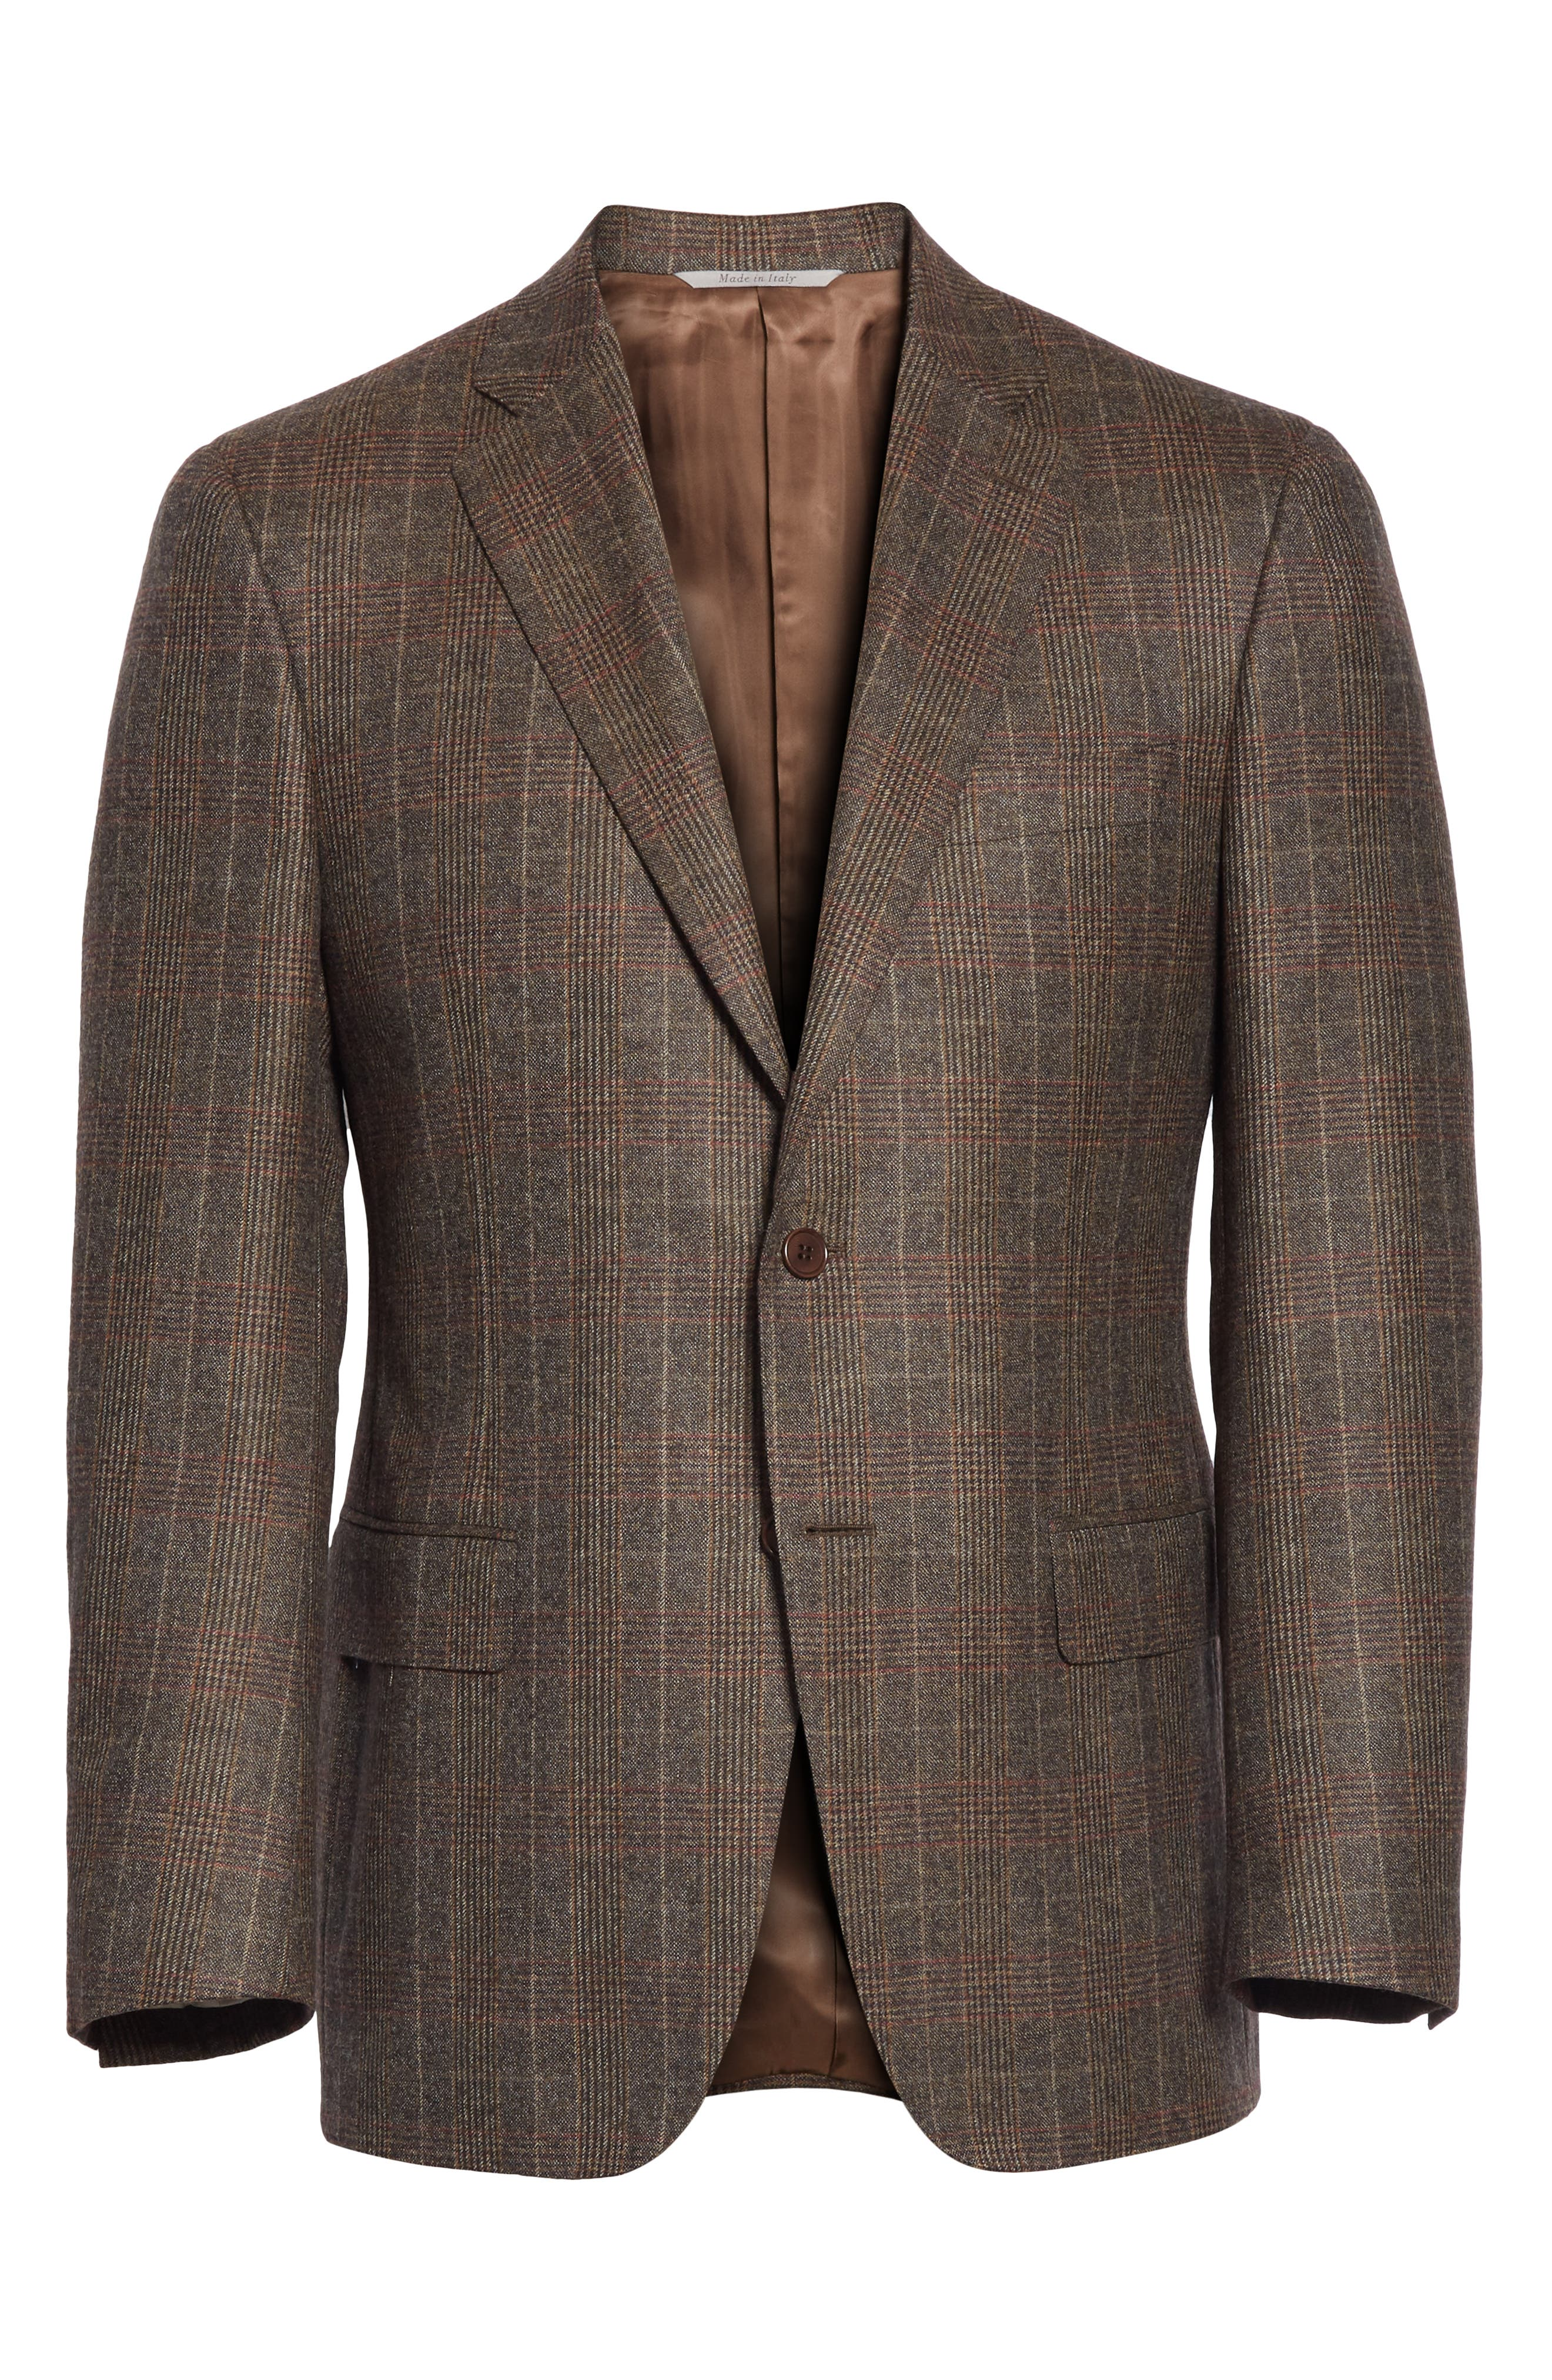 CANALI,                             Classic Fit Plaid Wool Sport Coat,                             Alternate thumbnail 5, color,                             200